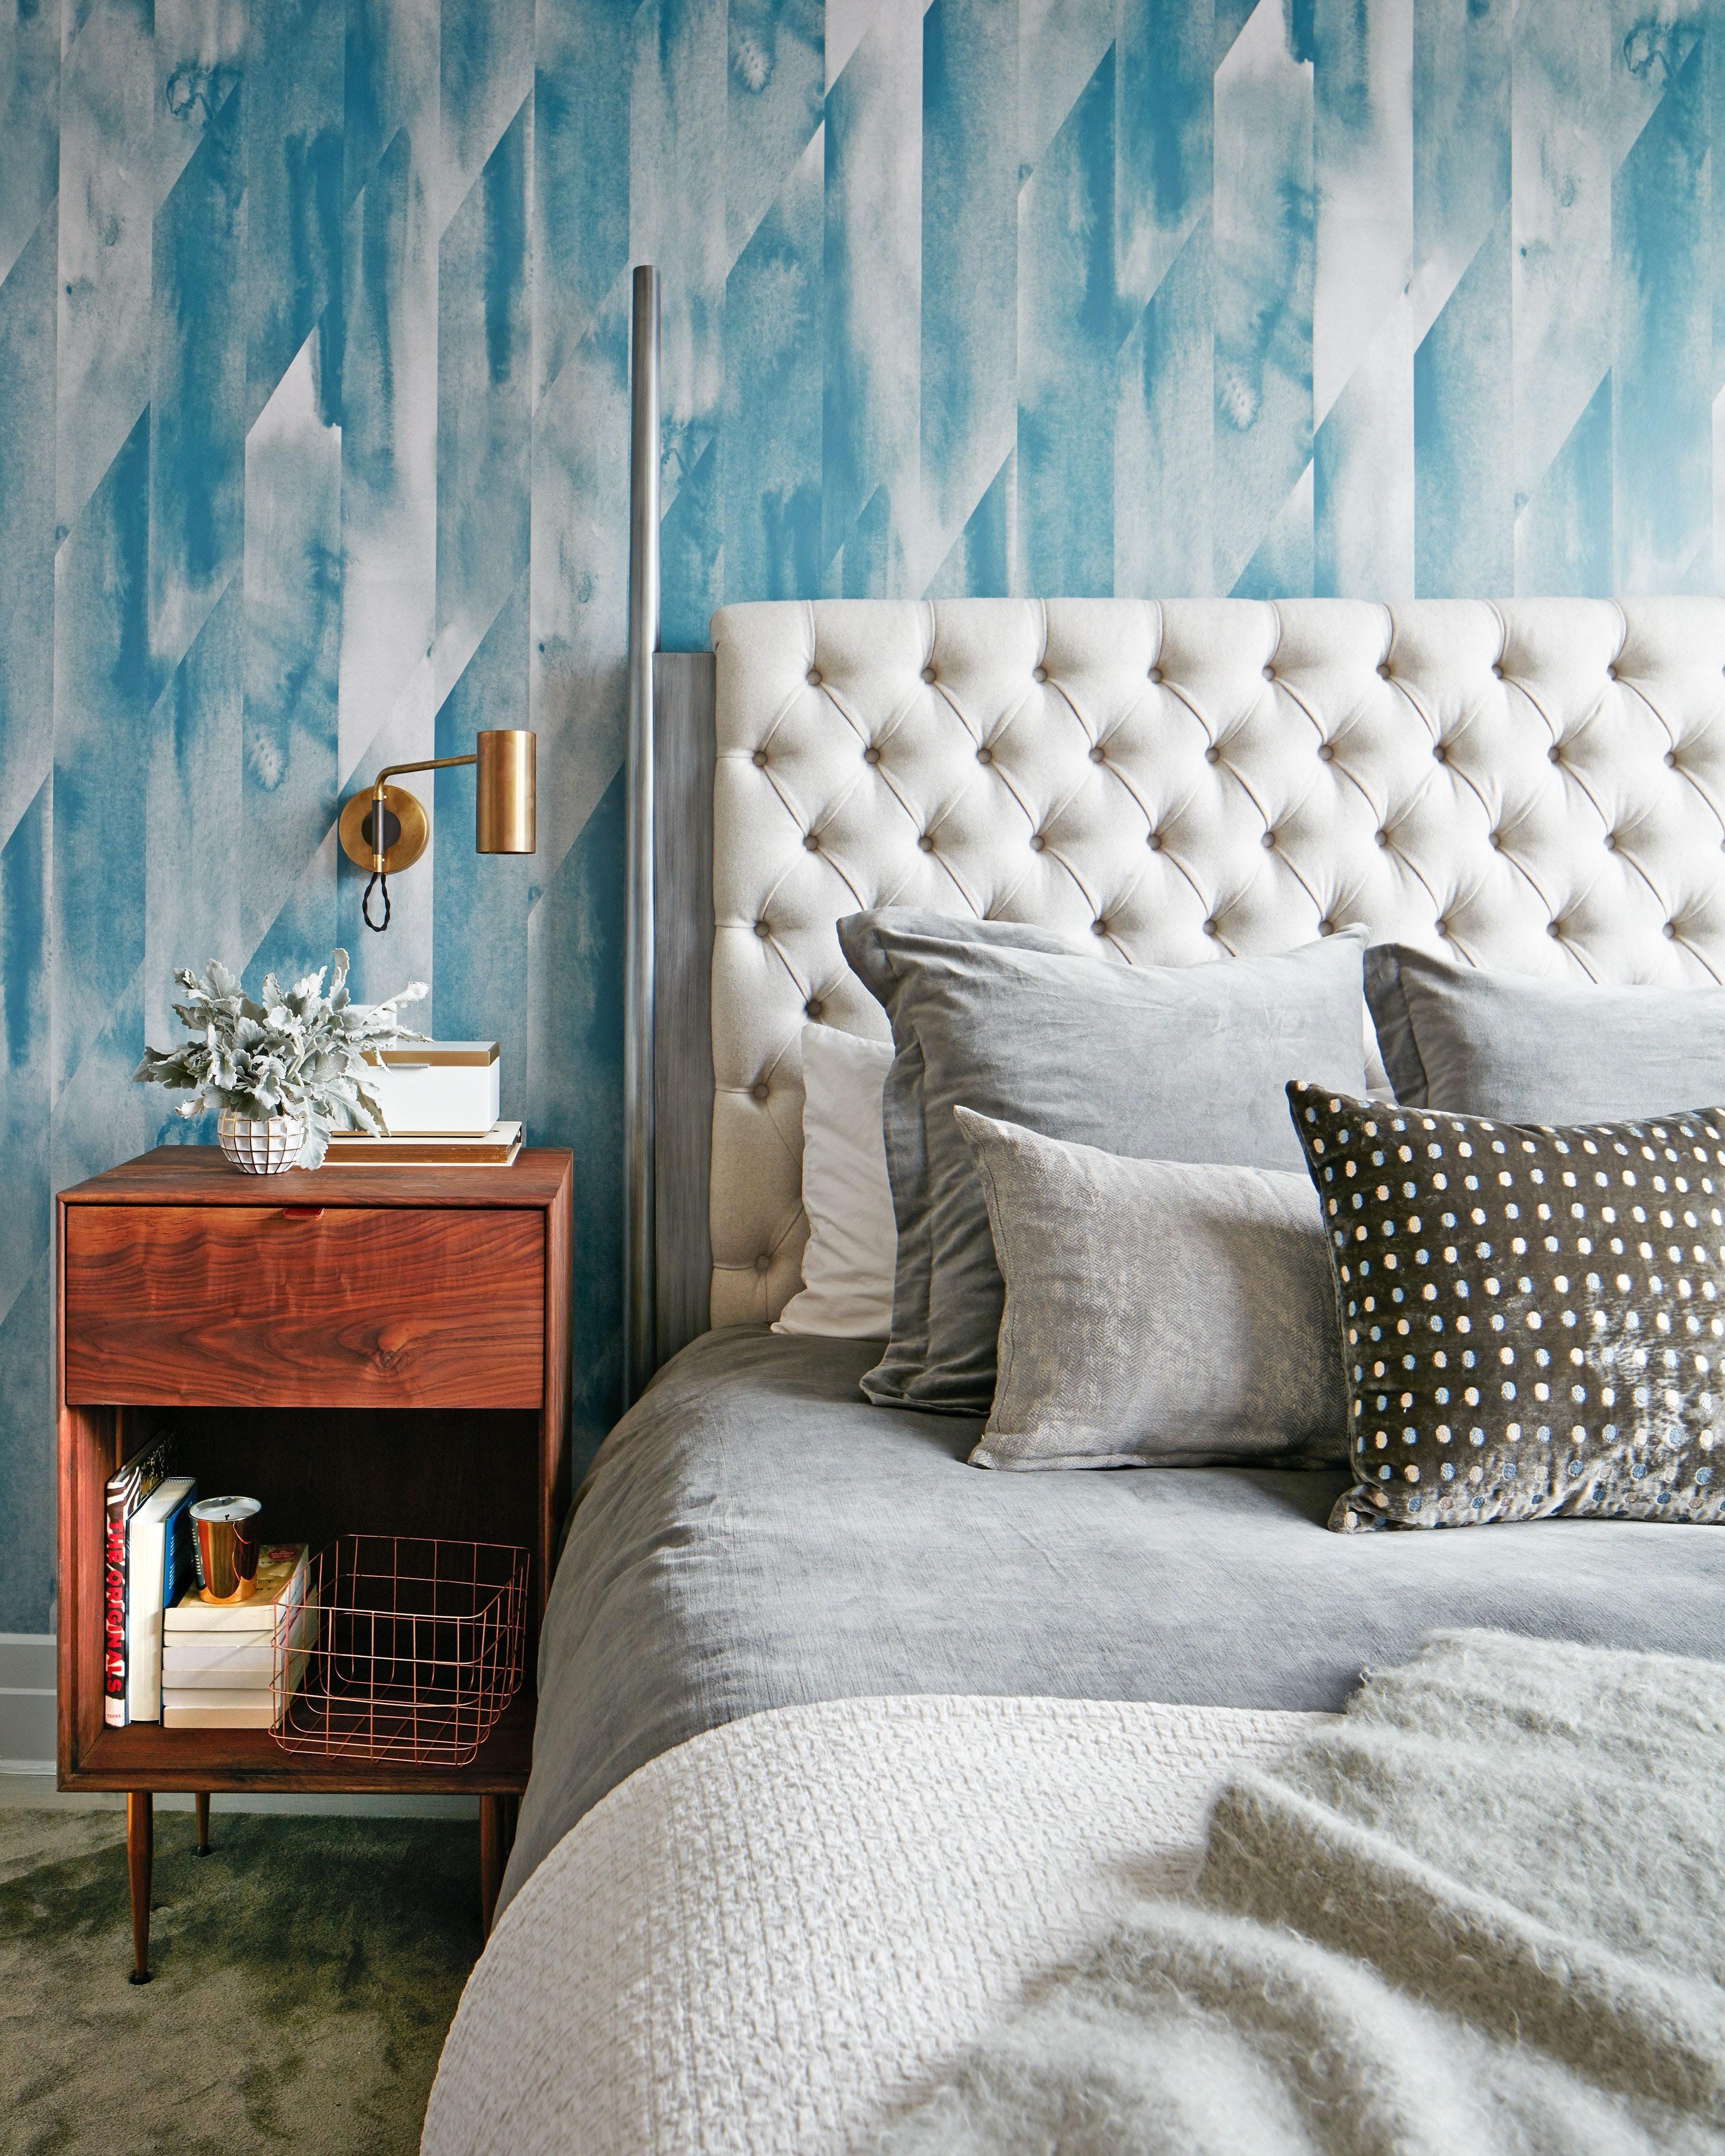 Bdiwdehd50 Bedroom Decorating Ideas Wallpaper Desktop Extraordinary Home Design Today 2020 12 13 Download Here